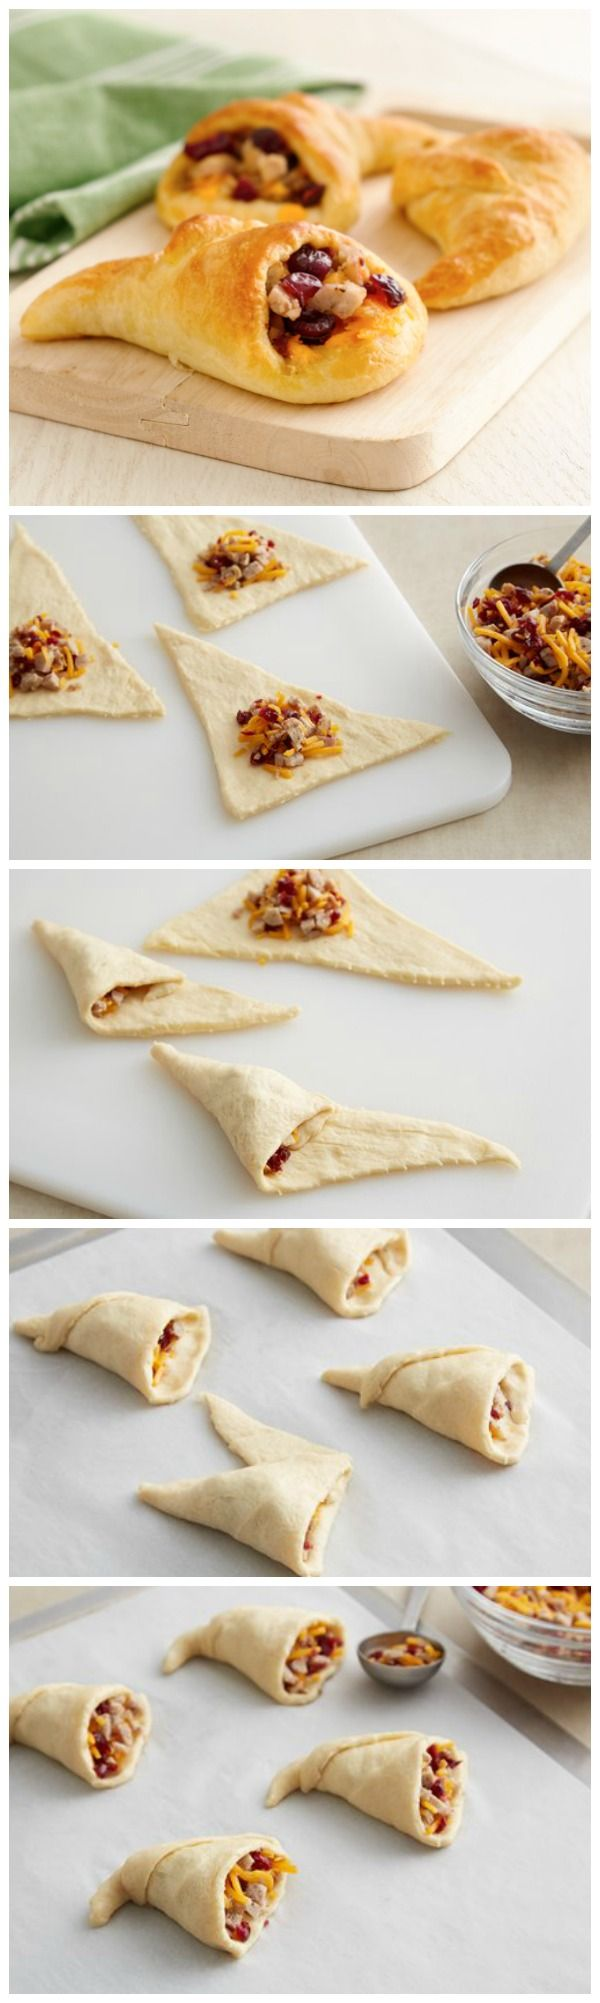 Pillsbury Crescent Cornucopias stuffed with sausage: your new turkey sidekick for Thanksgiving!